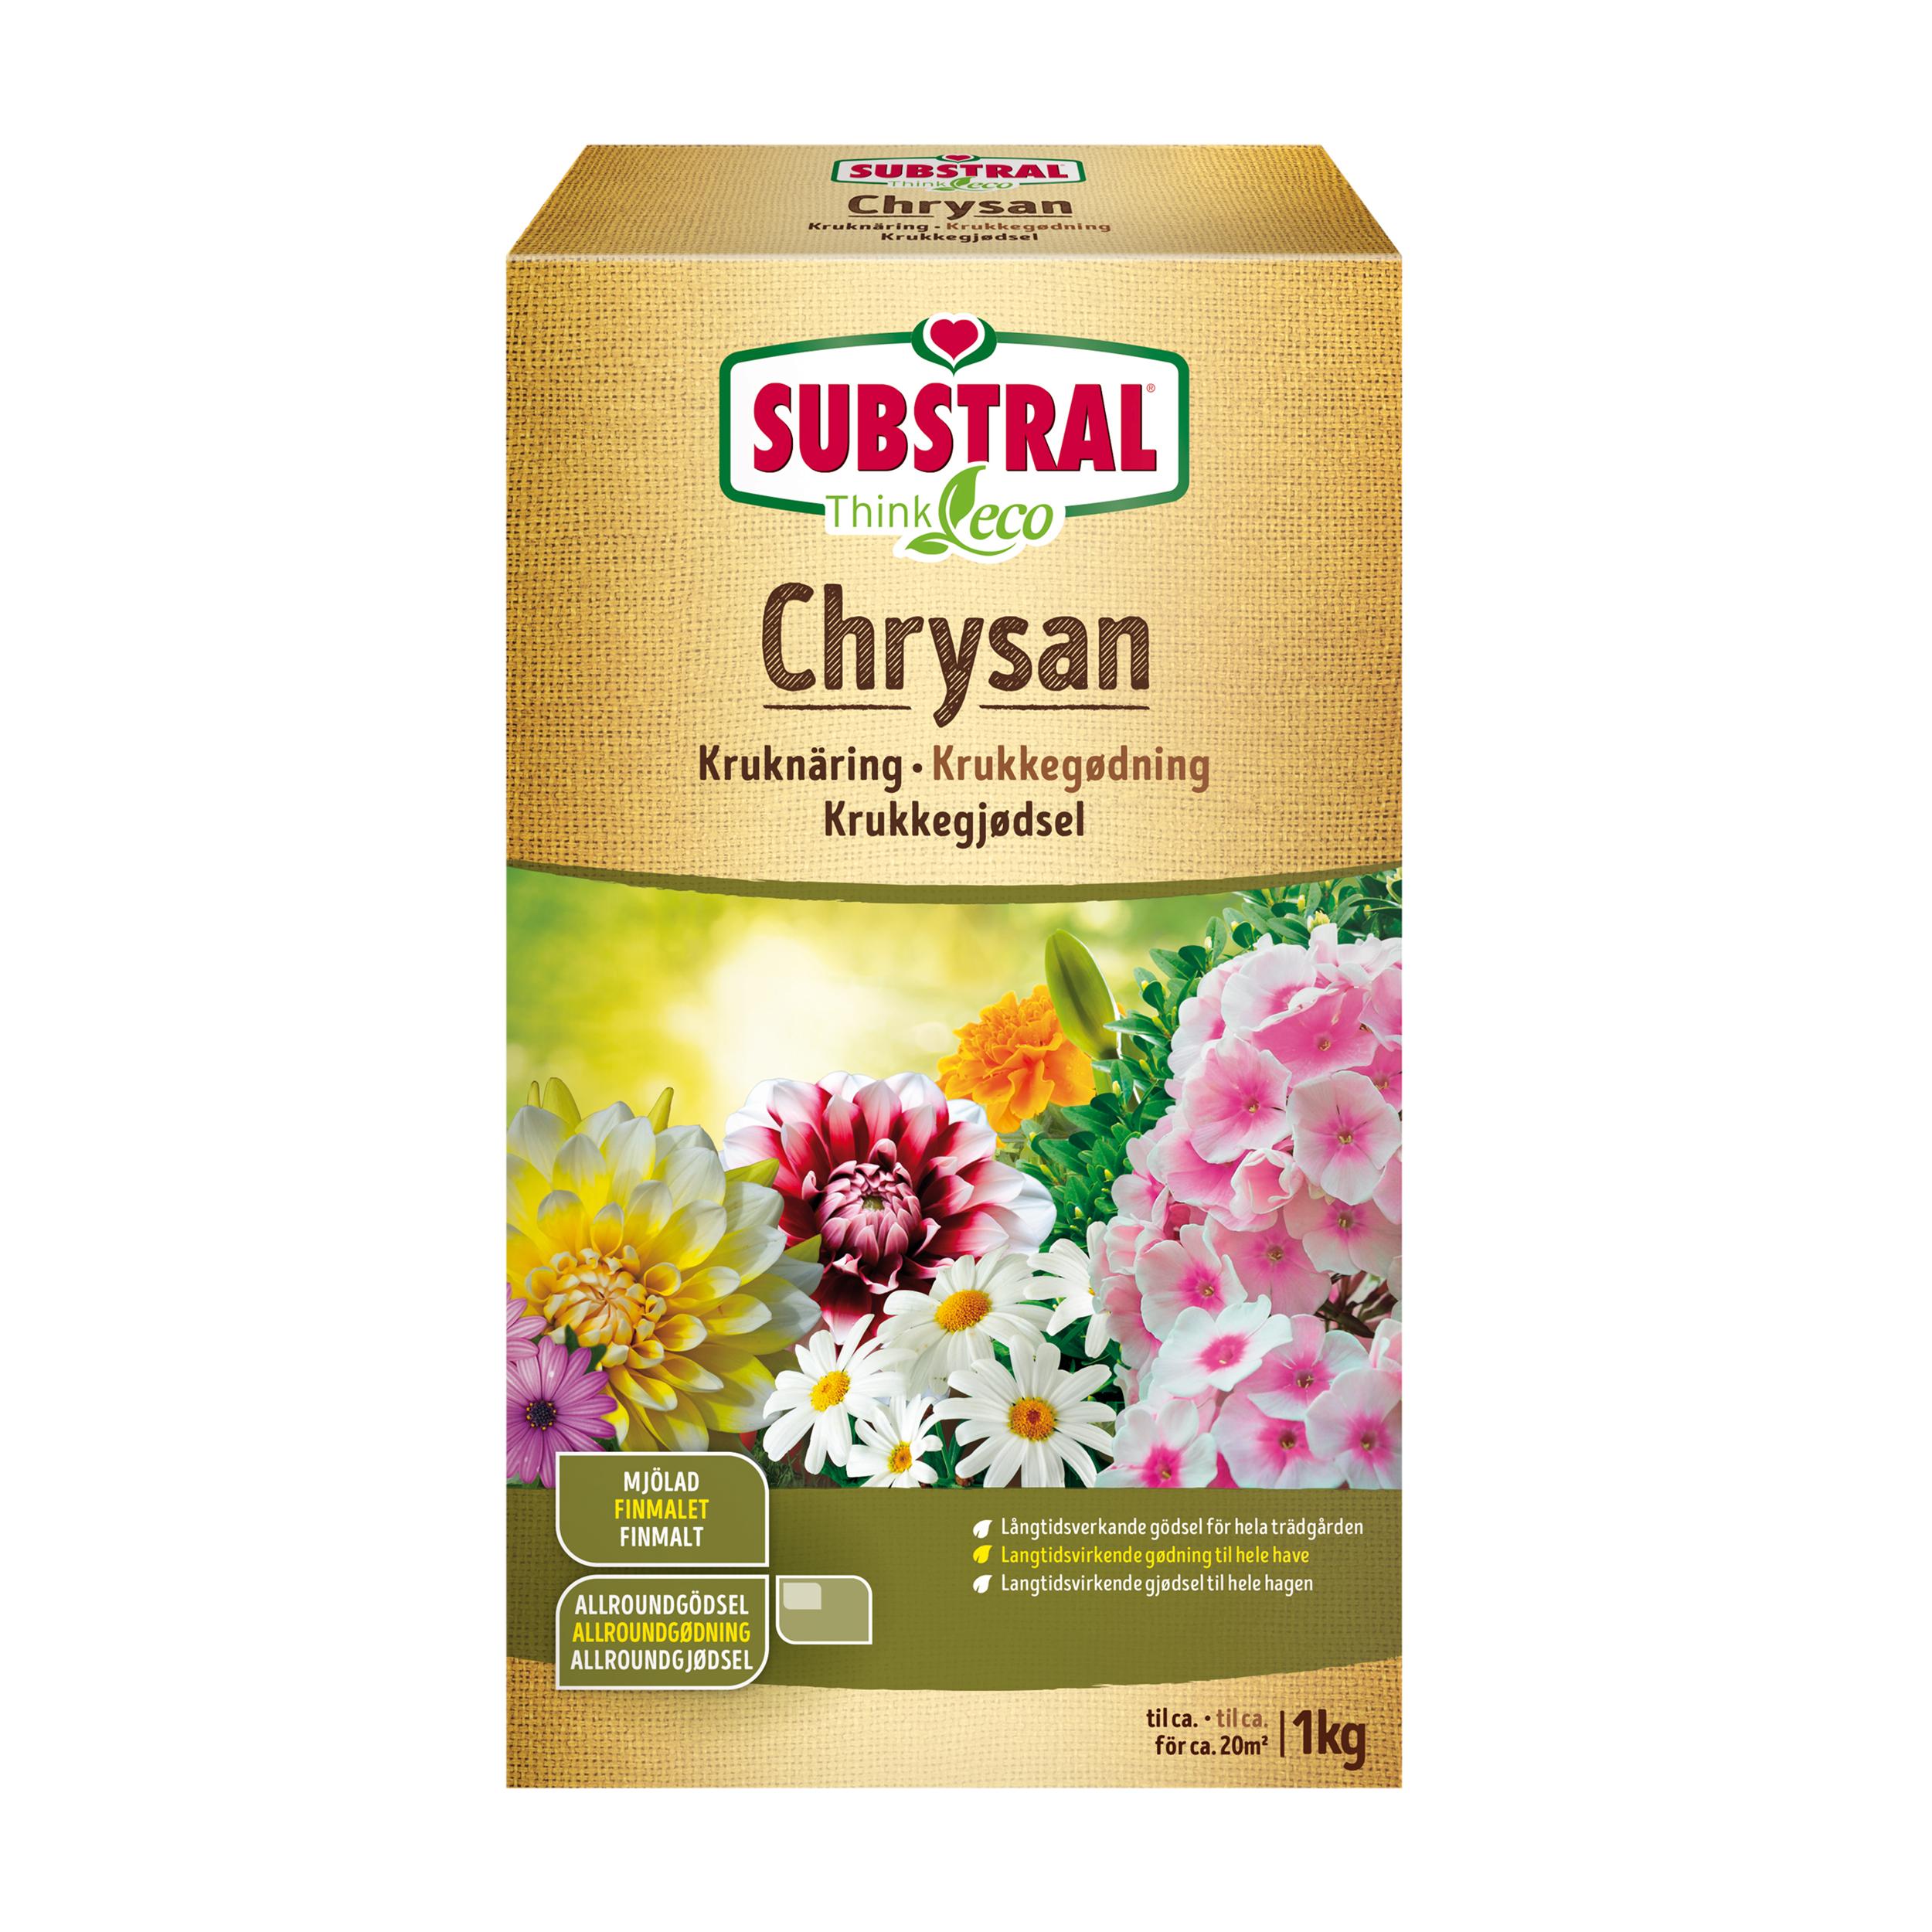 Produktbild på Chrysan Substral think eco